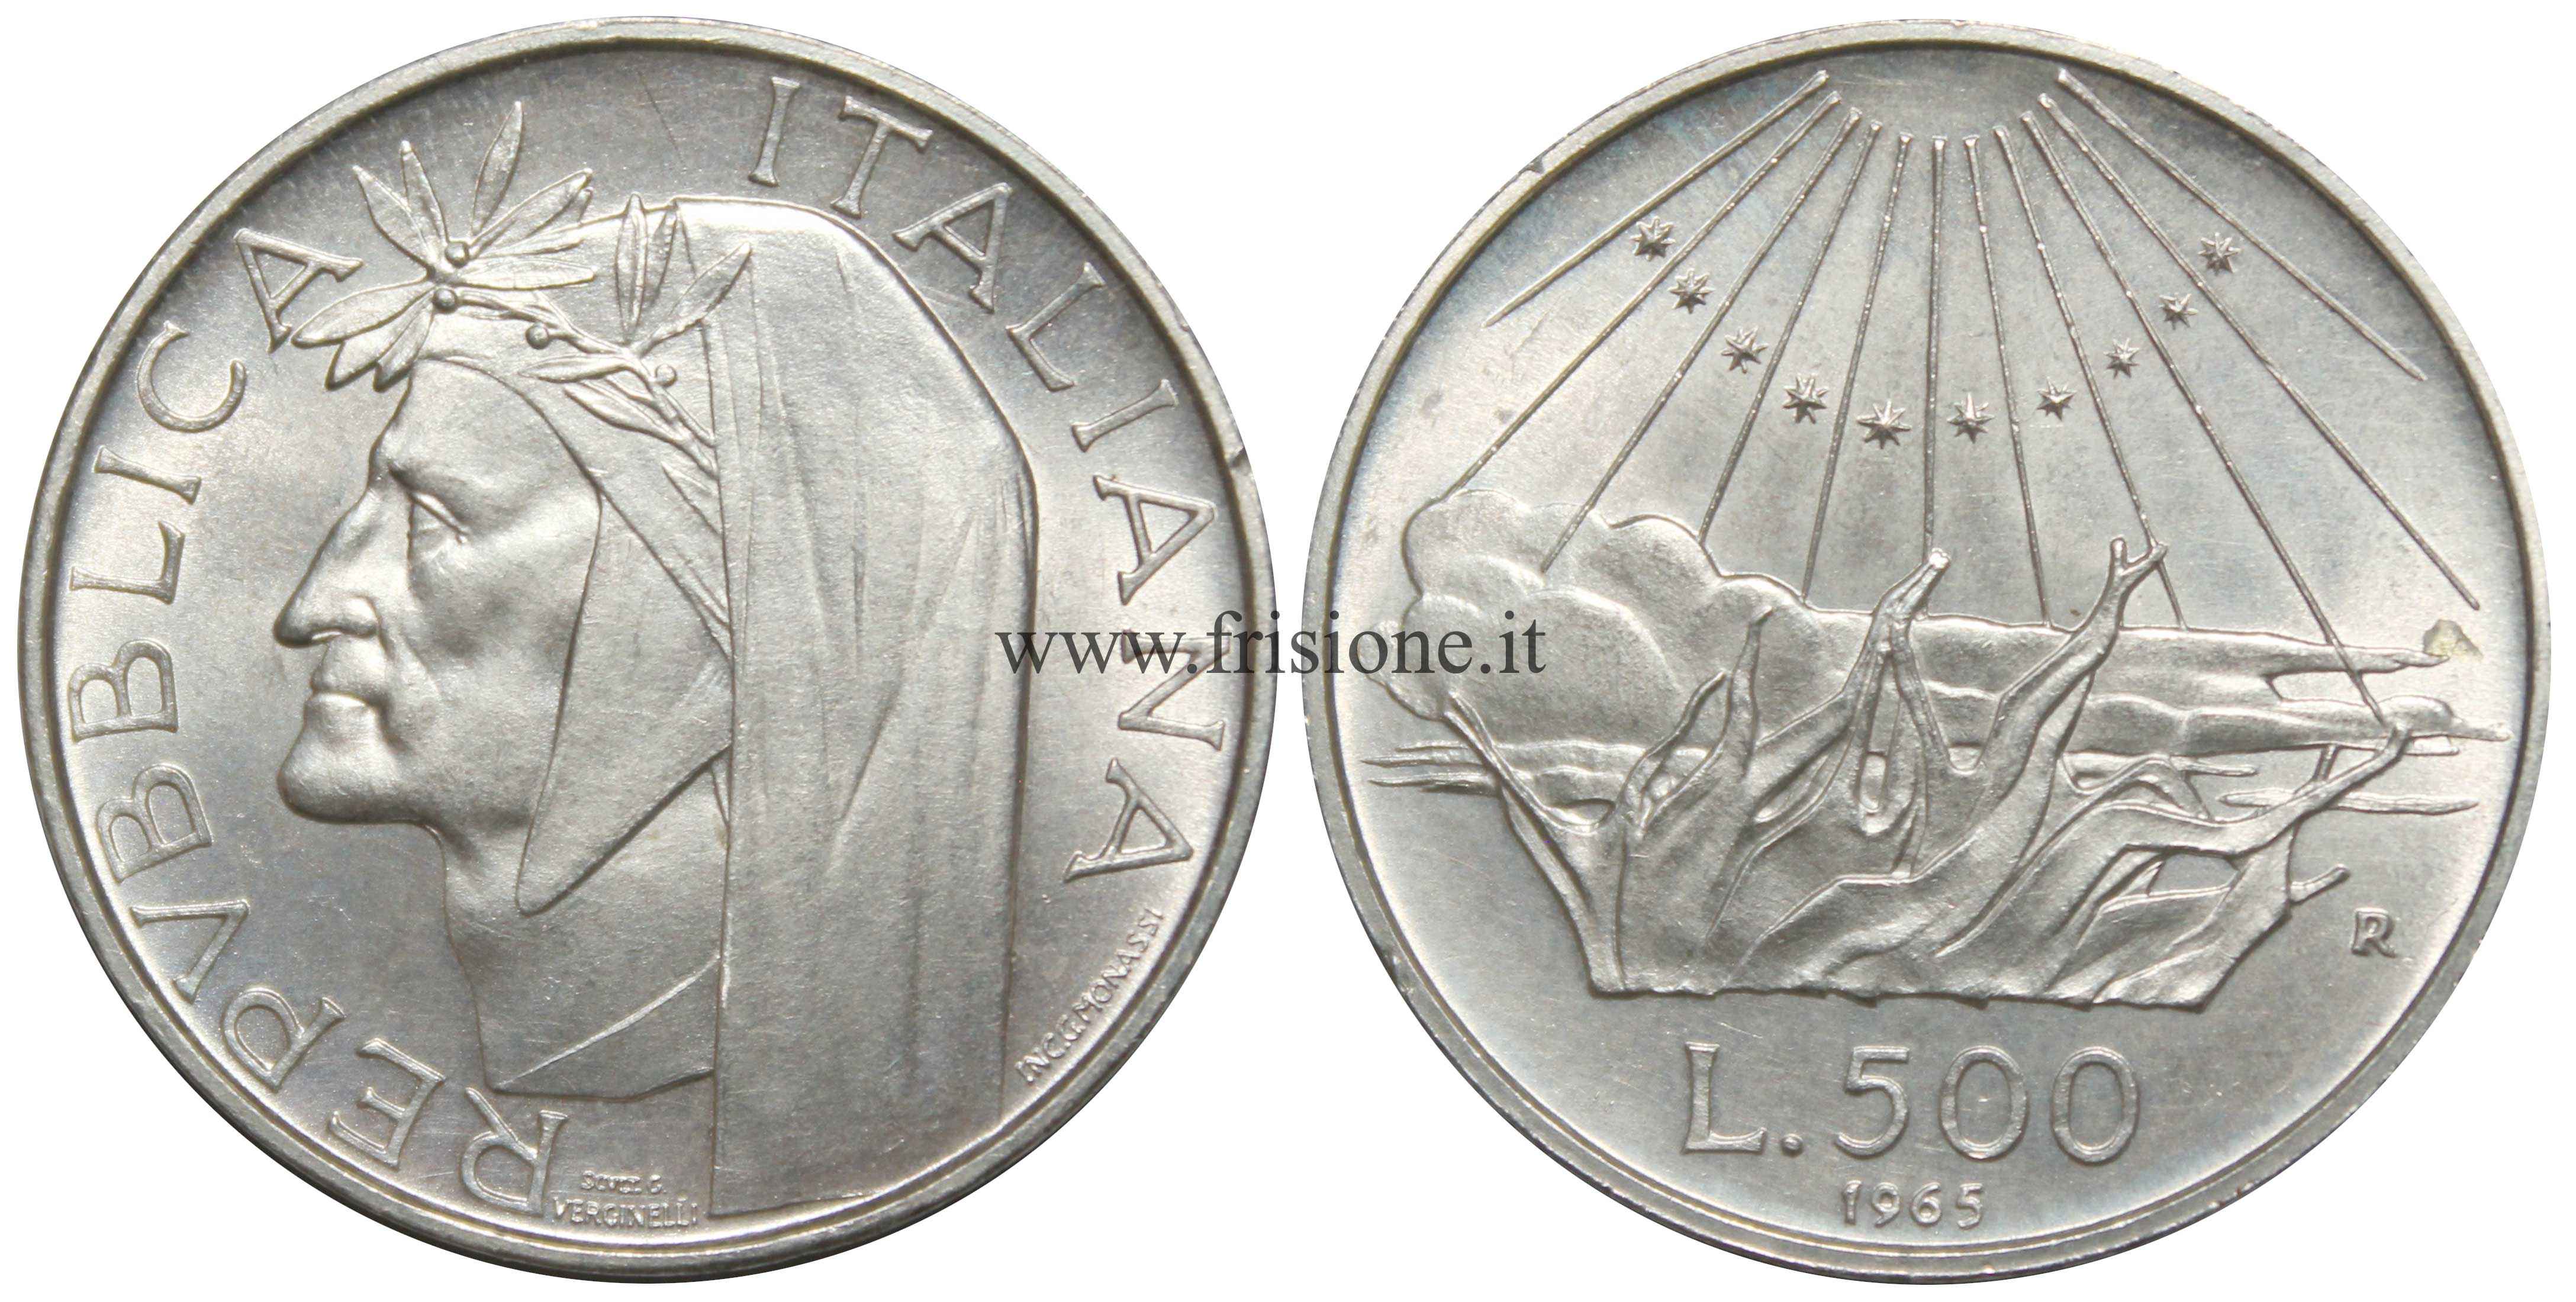 4a2d308f57 Italia 500 Lire Argento caravelle, Dante, Centenario